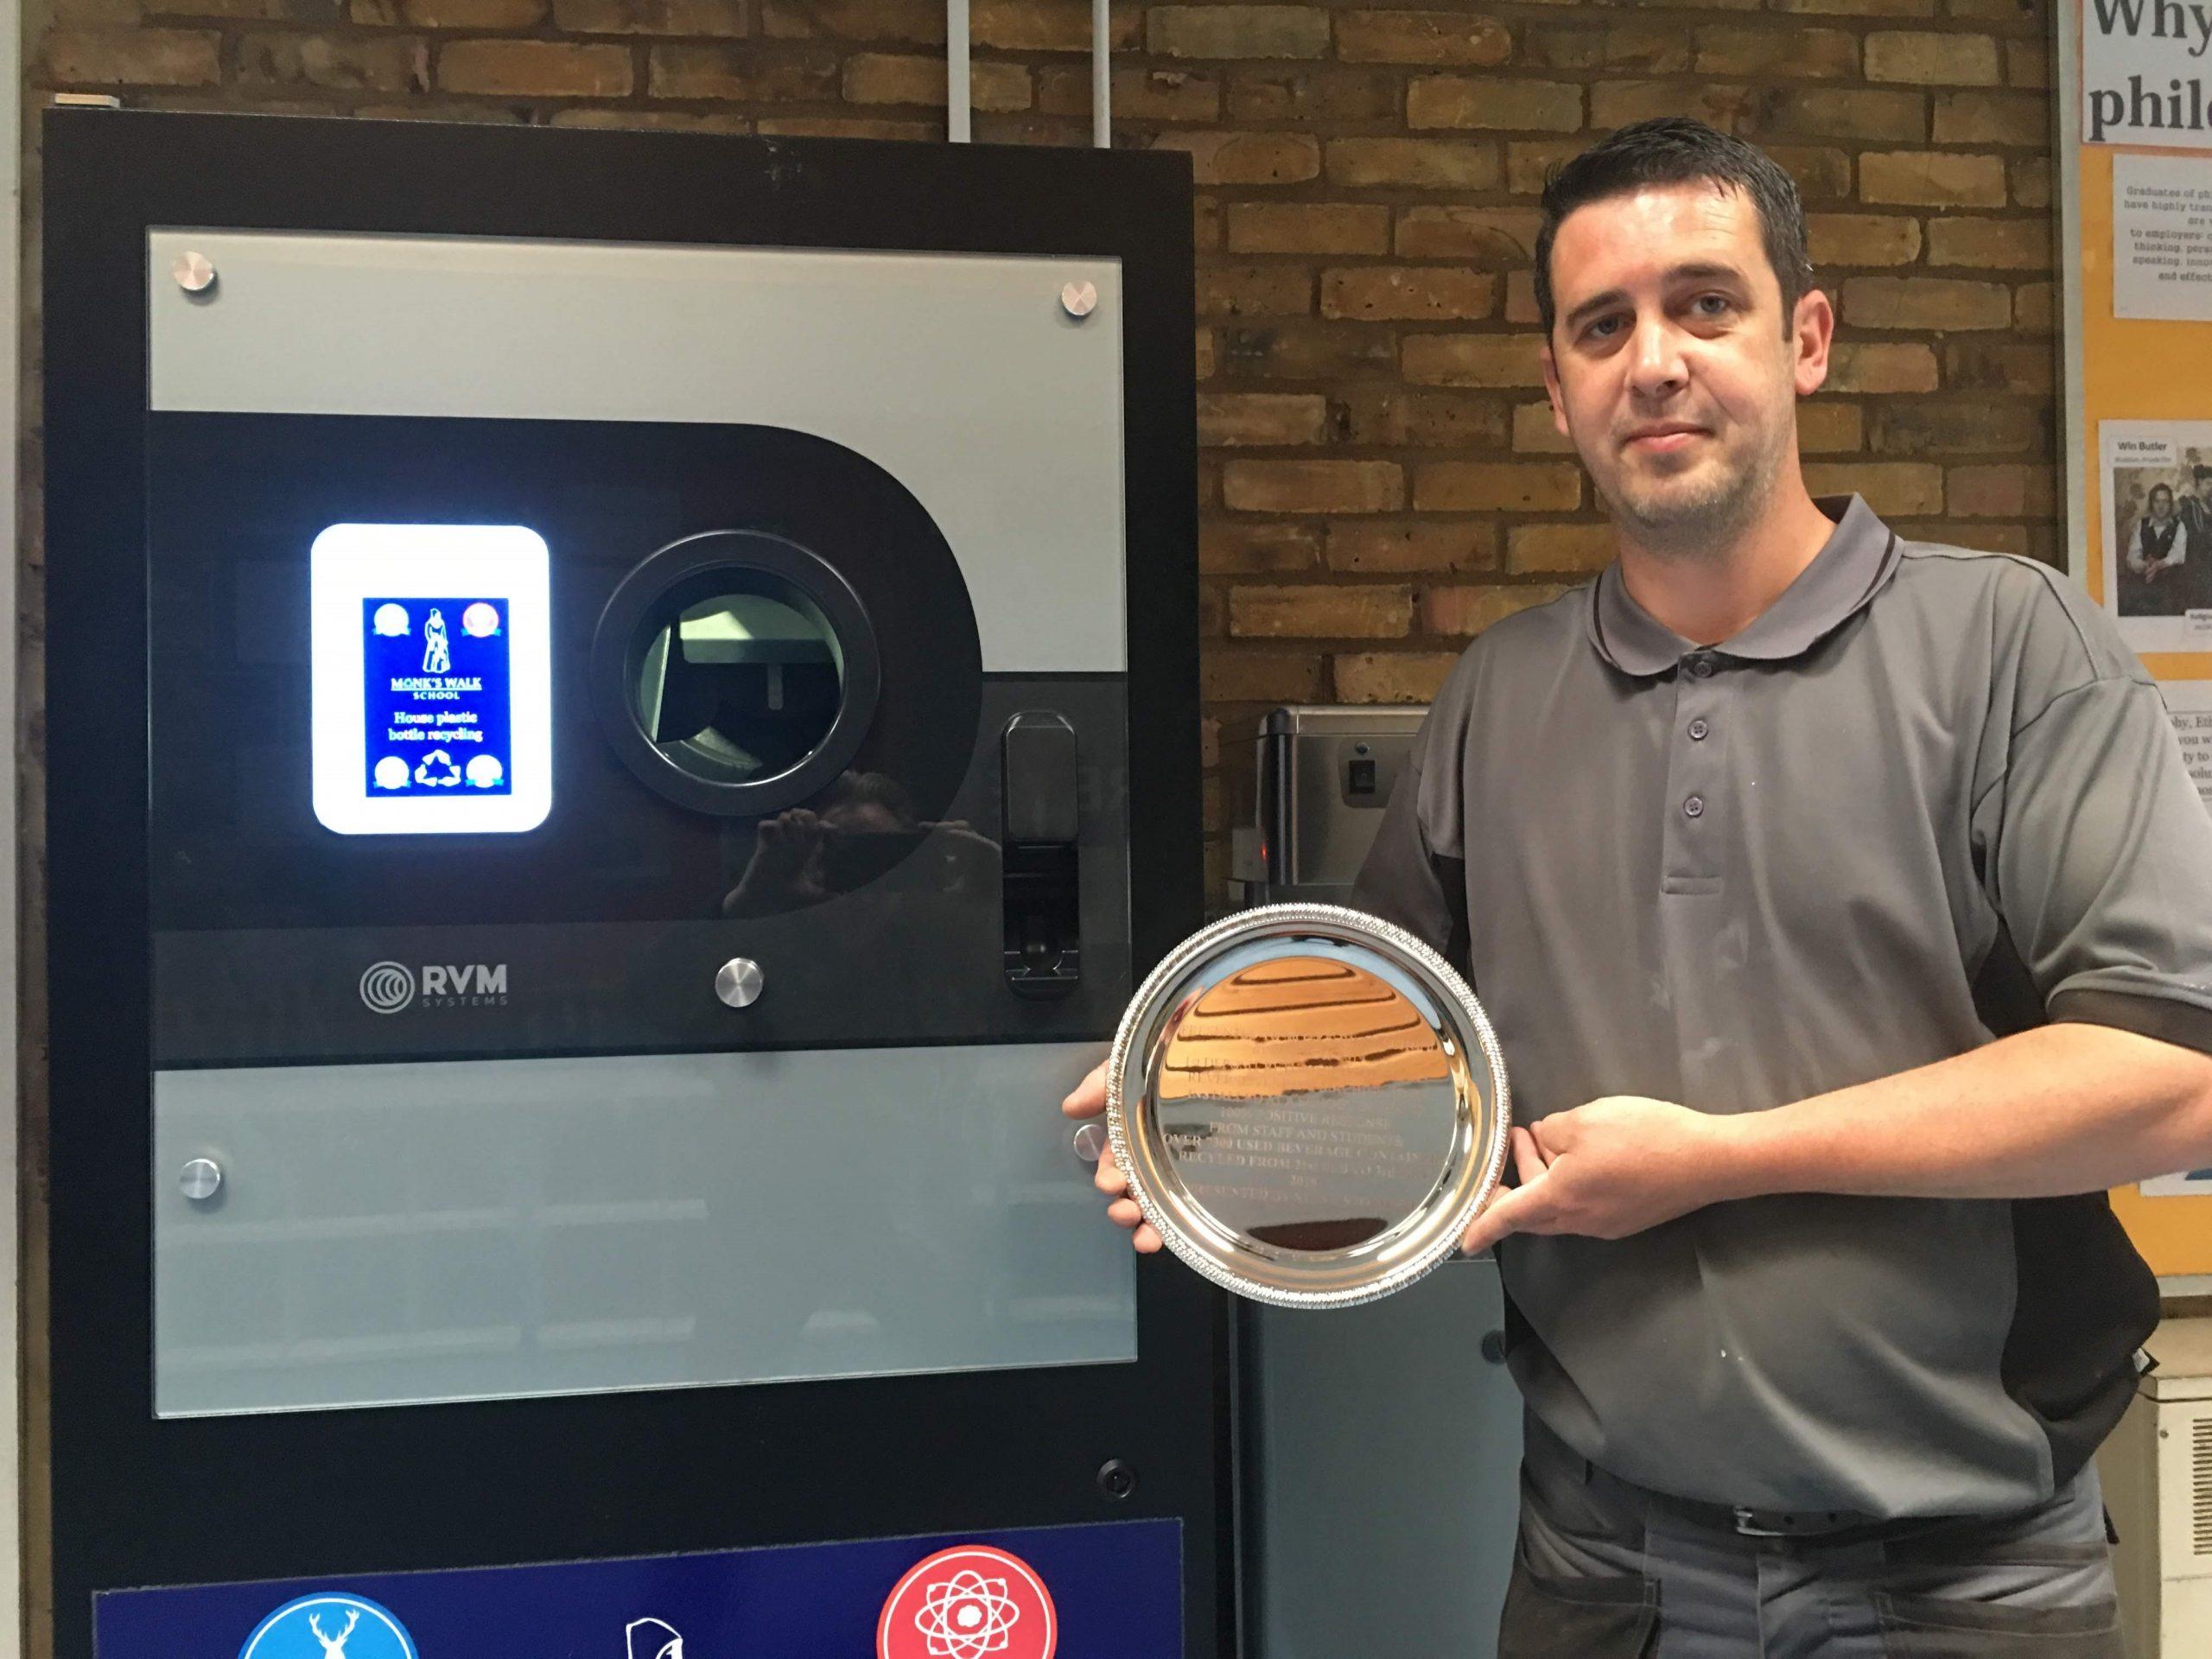 Monks Walk School Award for first School Deposit Return Scheme RVM in the UK